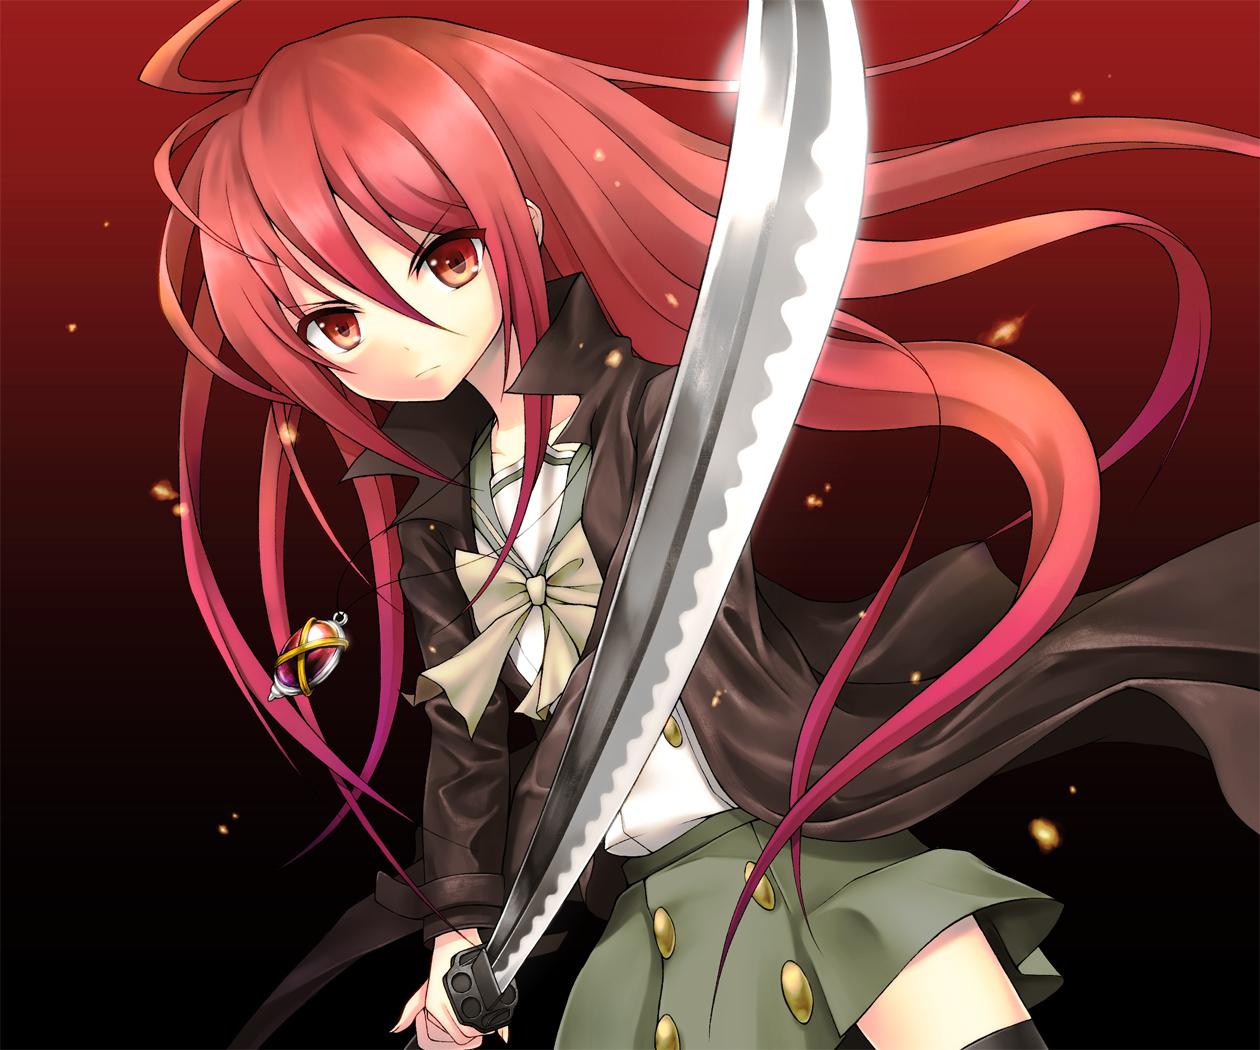 alastor katana maazyu necklace red red_eyes red_hair school_uniform shakugan_no_shana shana sword thighhighs weapon